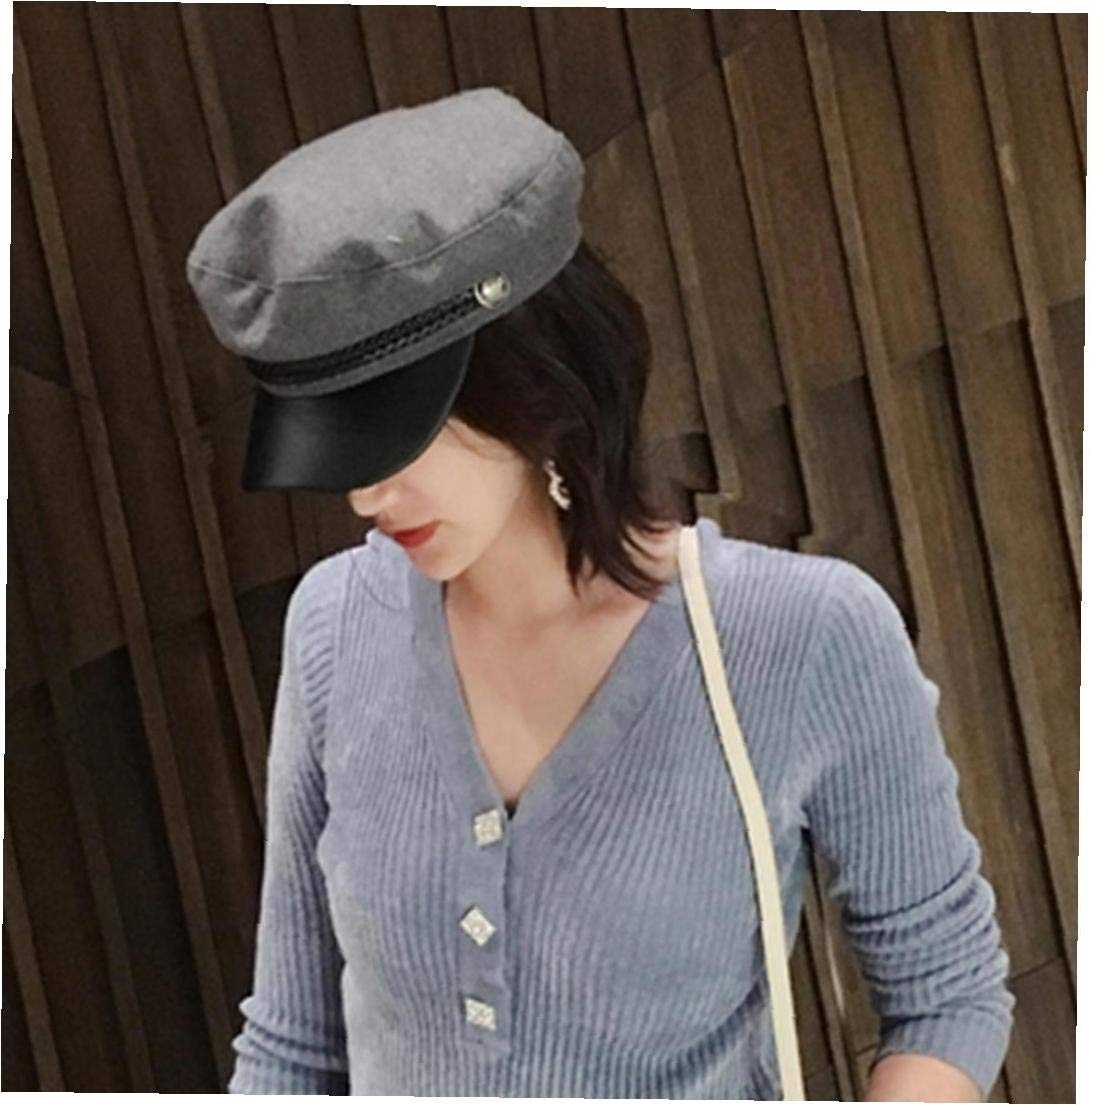 Zonfer Unisex PU-Leder-Milit/är Hut Cotton Matrosenm/ütze Flat Top Travel Cadet Hat Kapit/än Cap